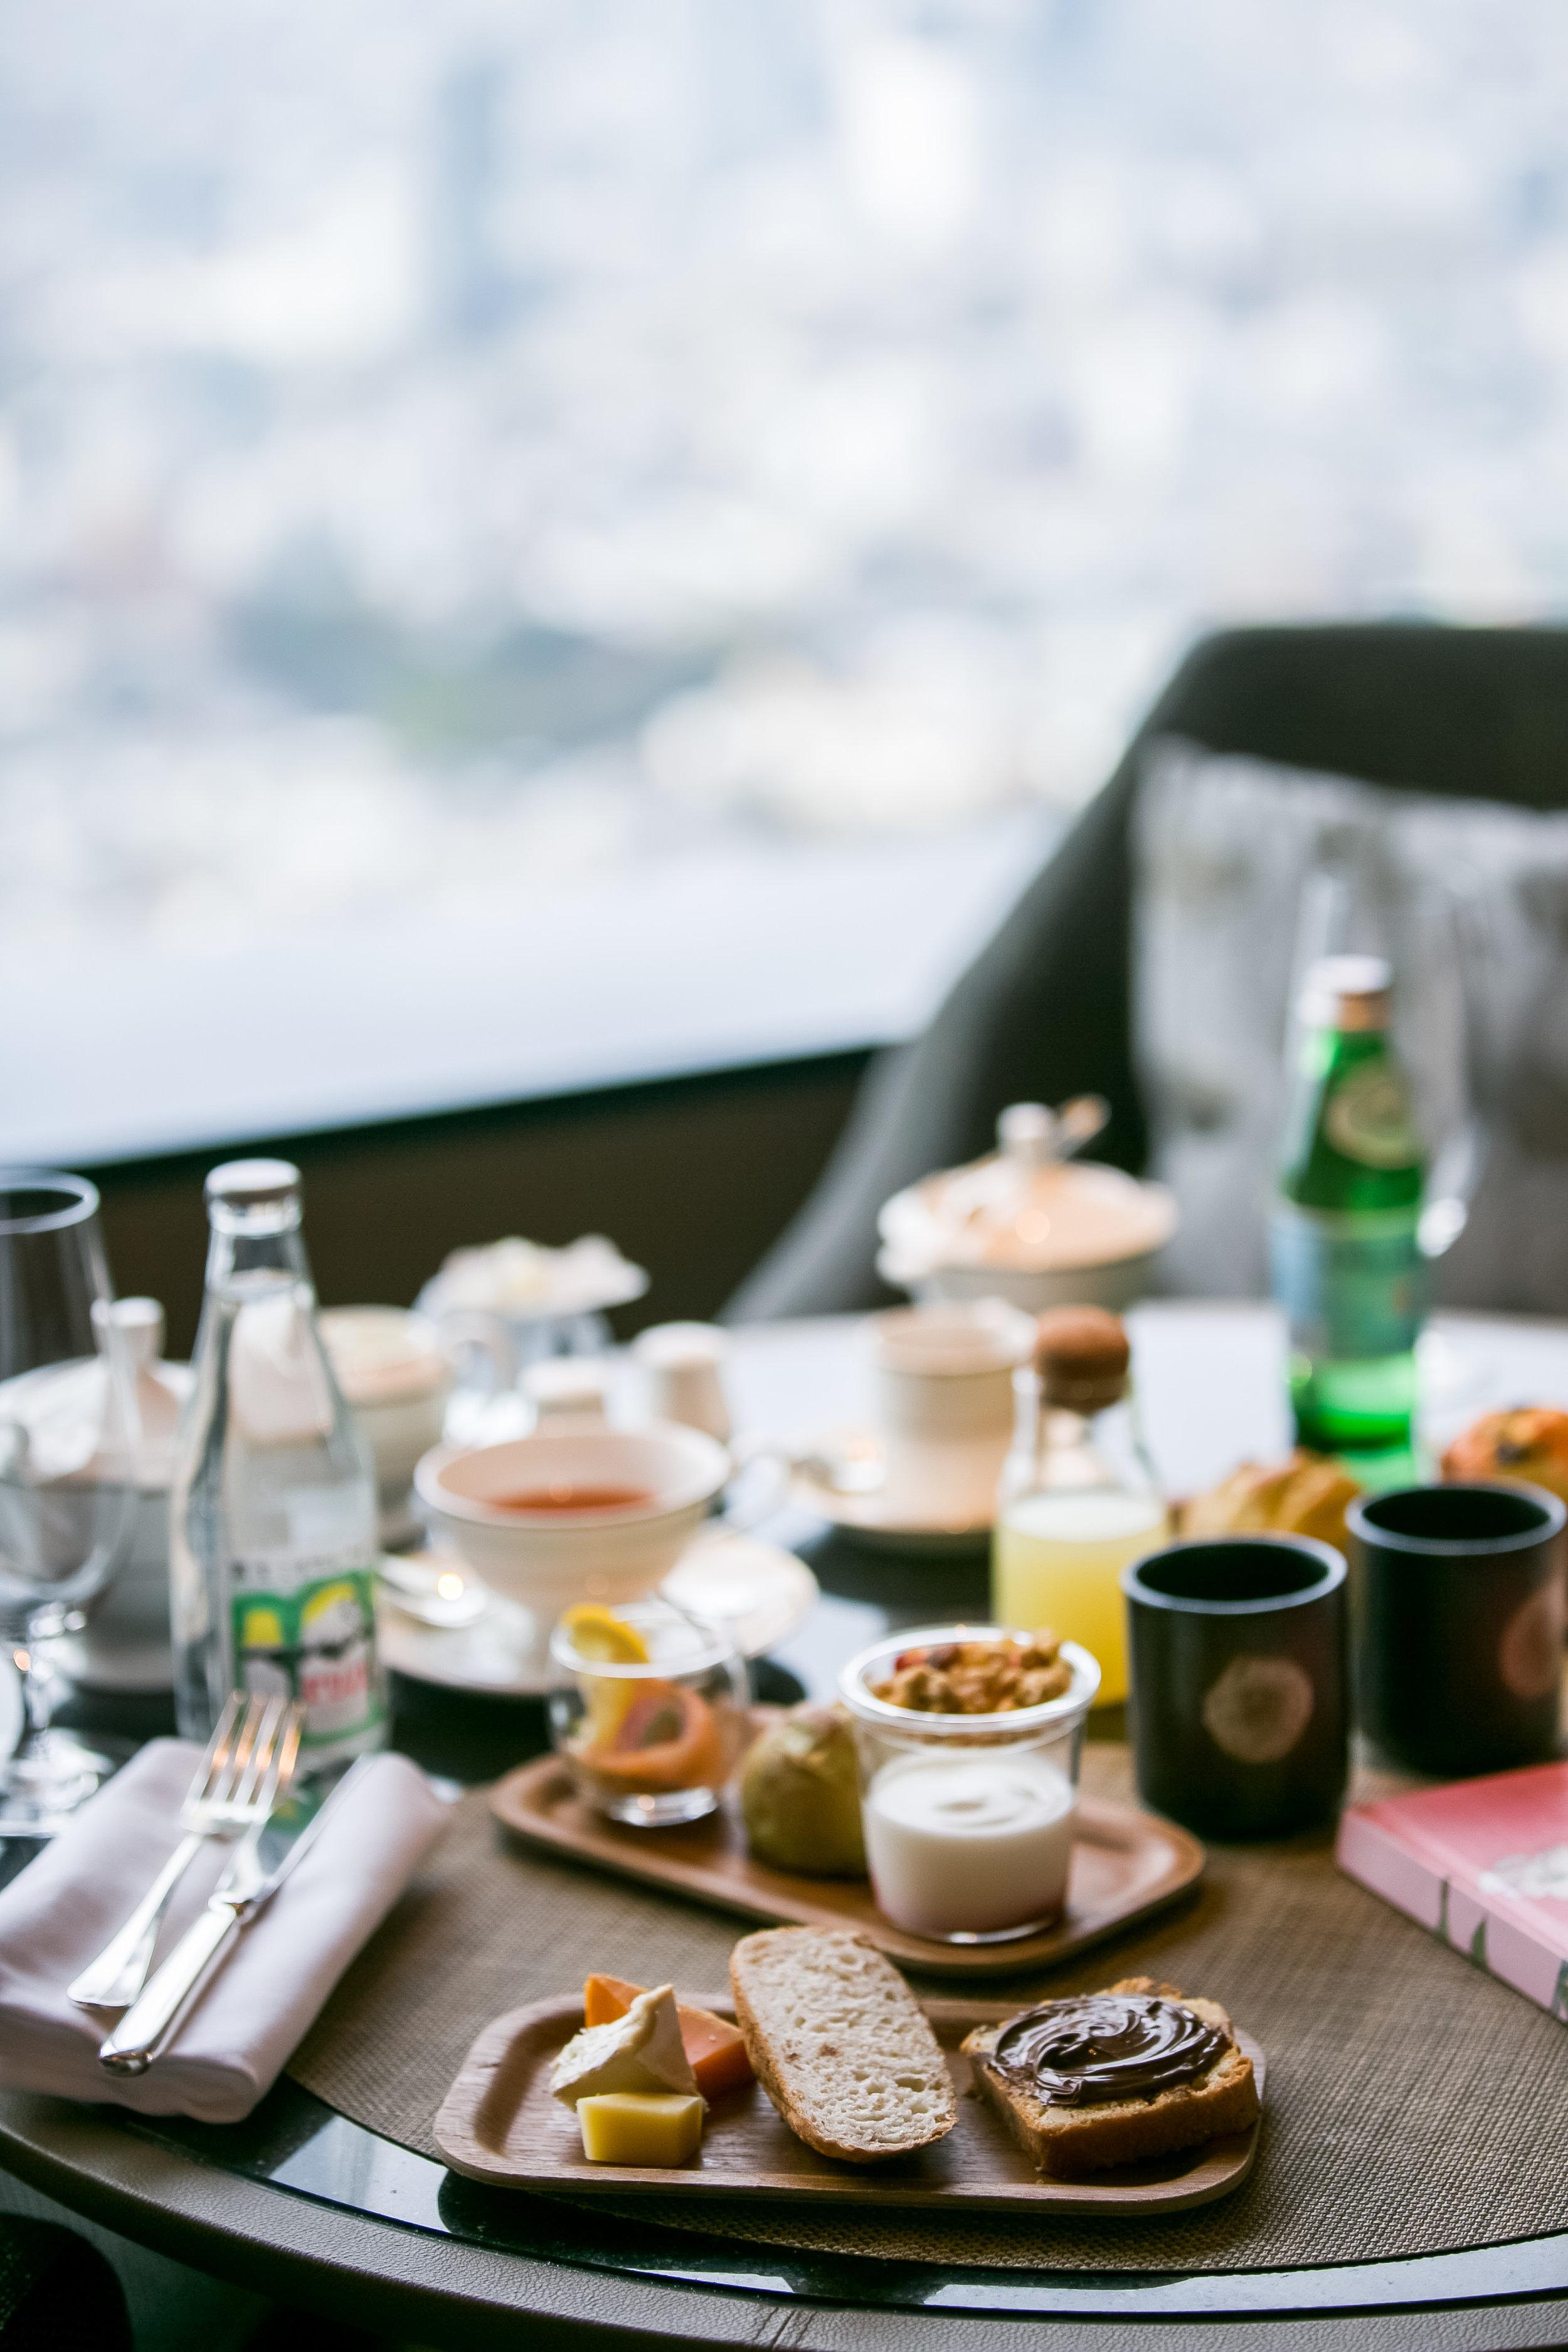 Breakfast spread at The Ritz-Carlton Tokyo